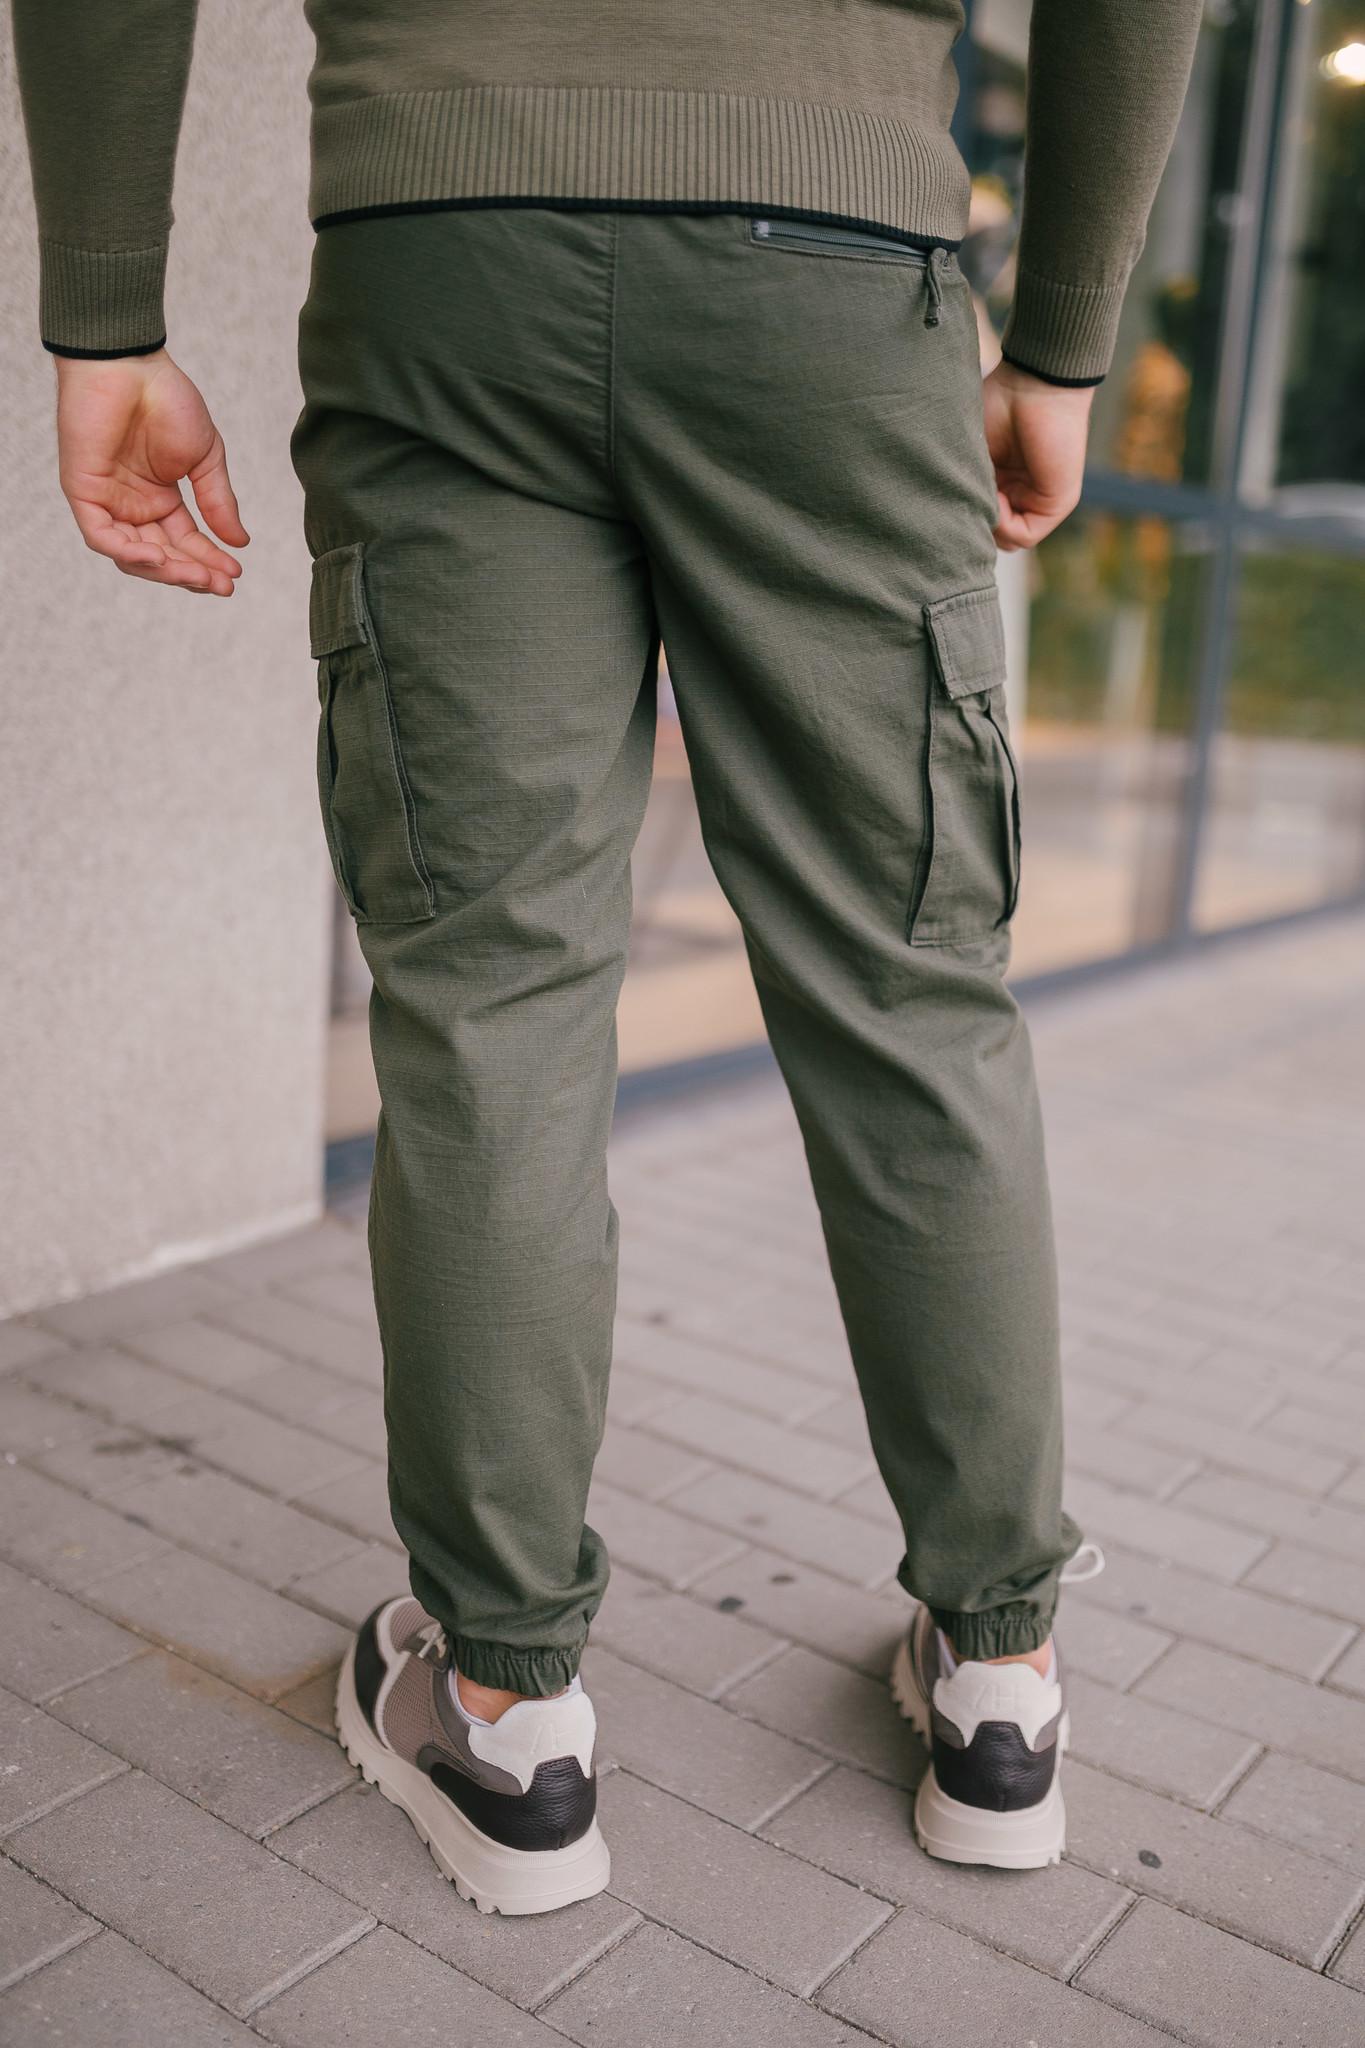 NIKO pantalon en coton biologique-2